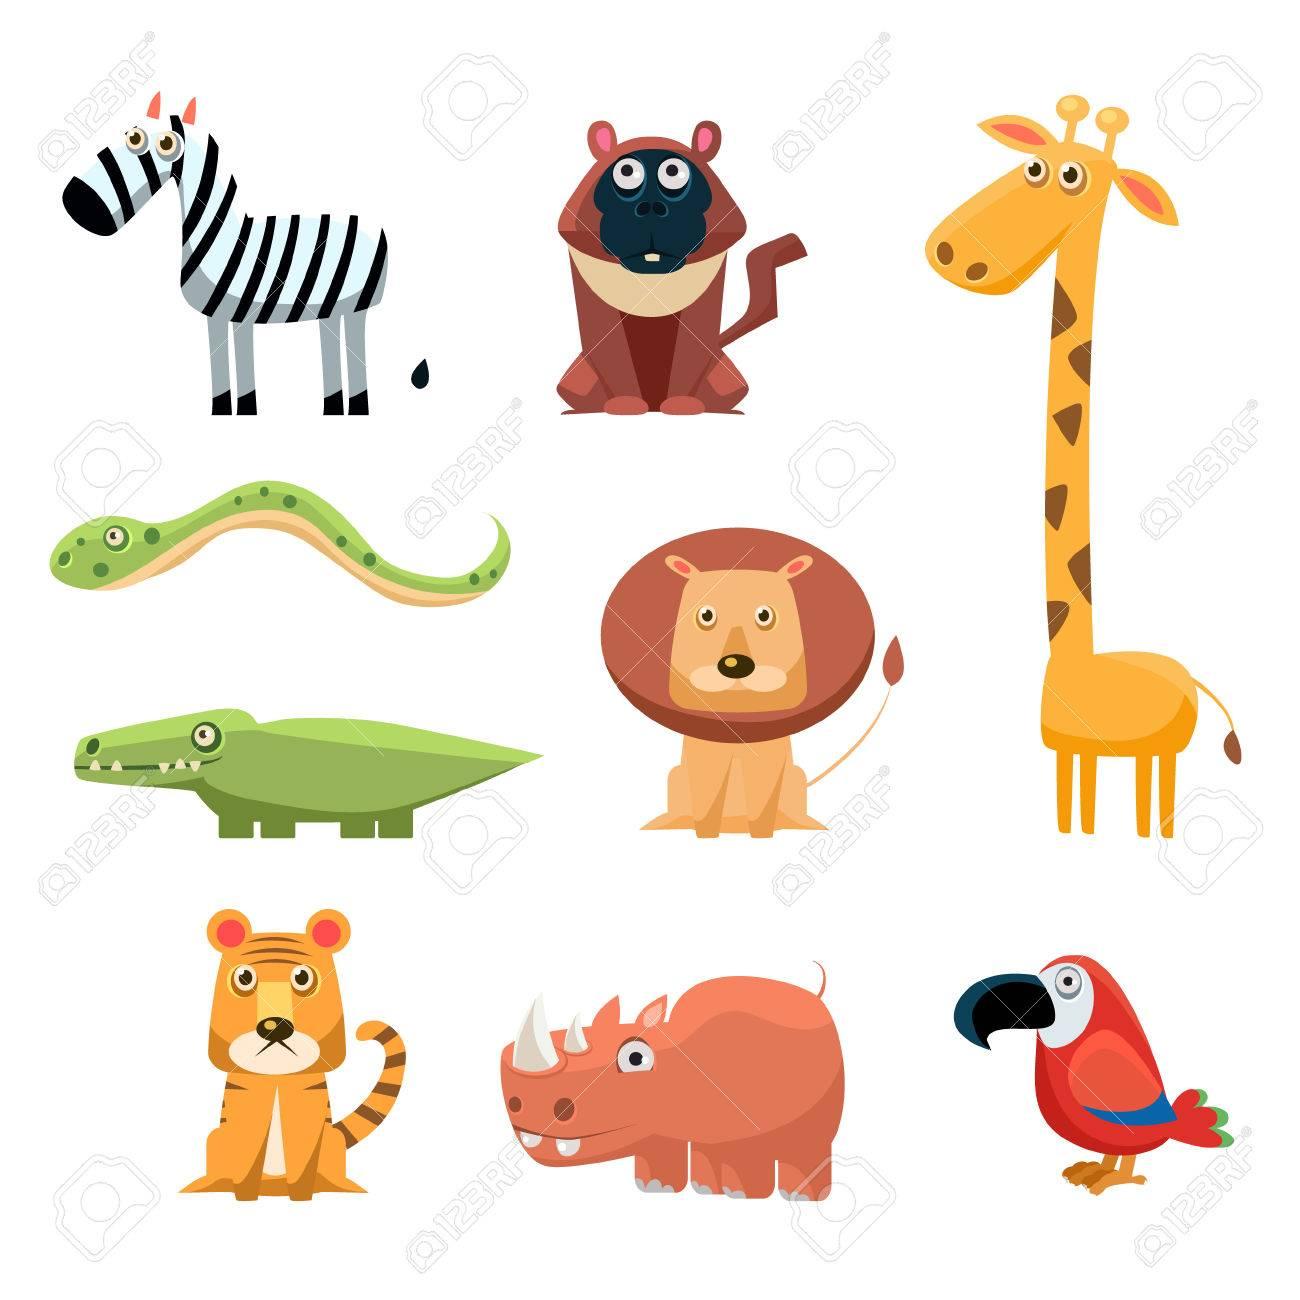 african animals fun cartoon clip art collection royalty free rh 123rf com free cartoon clip art for kids free cartoon clip art people